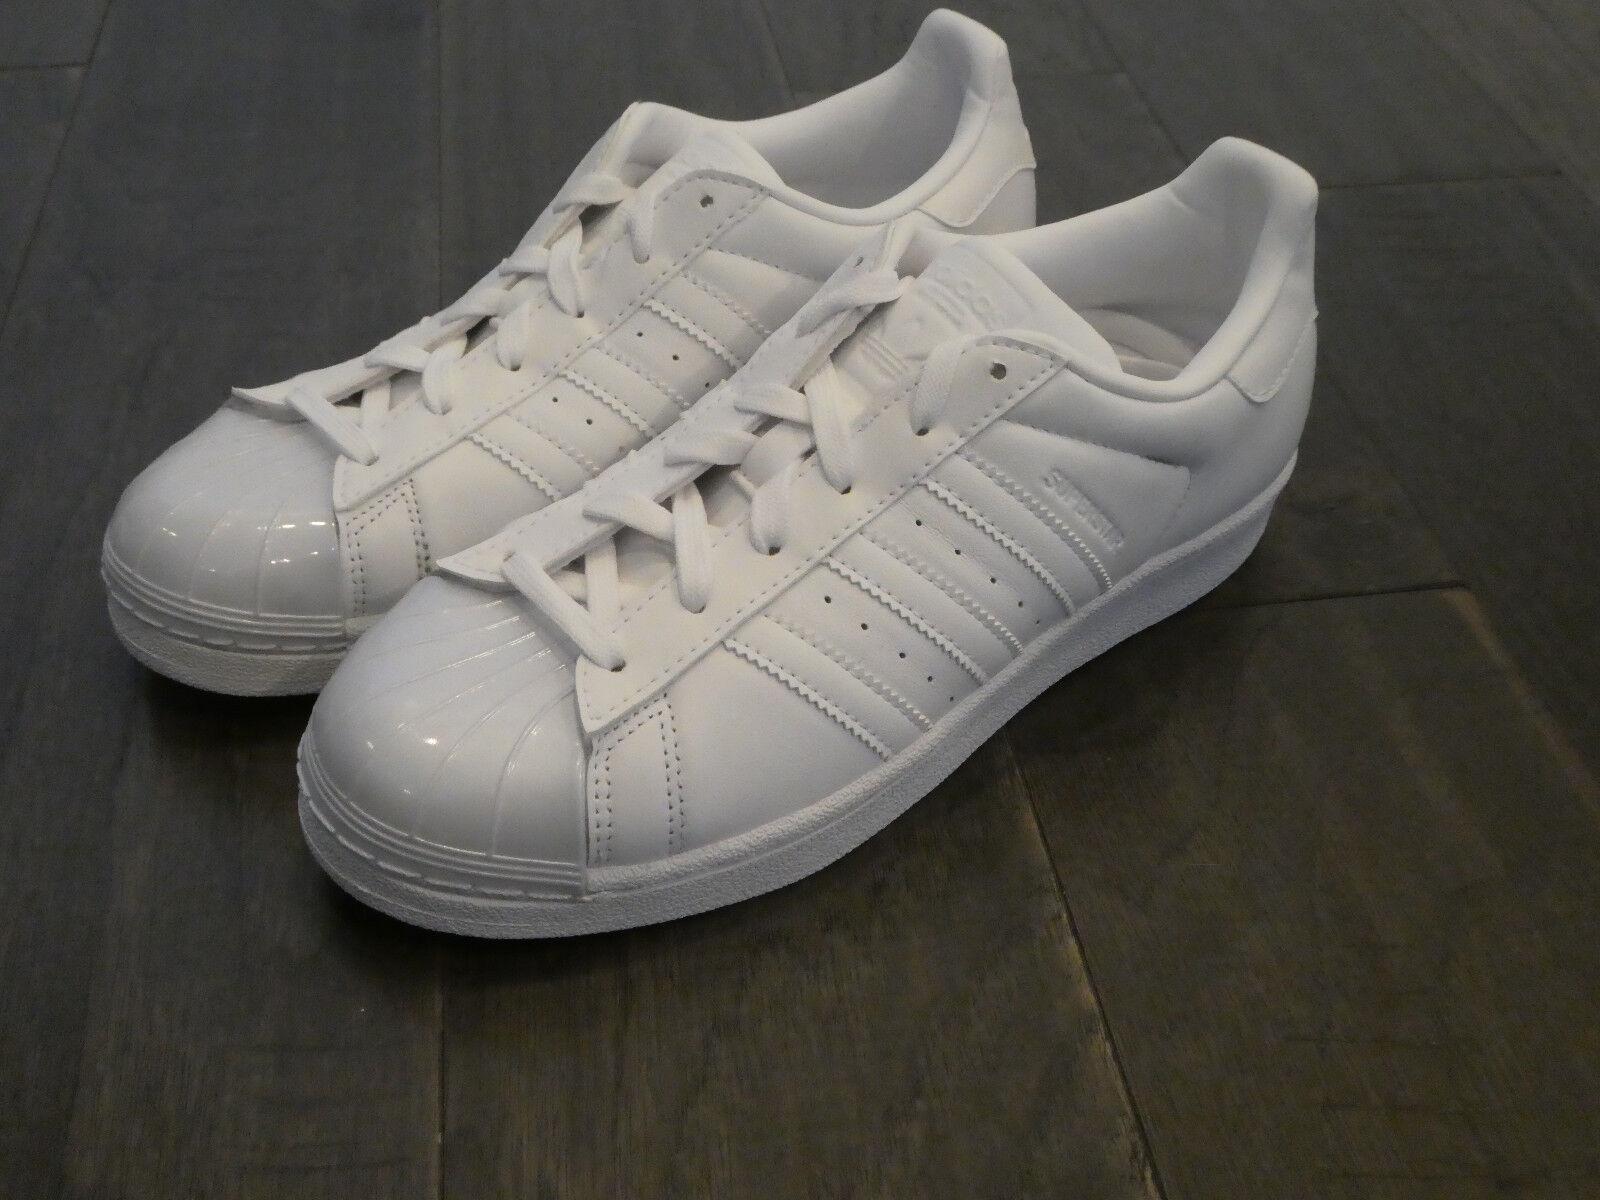 chaussures chaussures adidas  s s s superstar branchés nouvelles bb0863 Blanc  4b2547